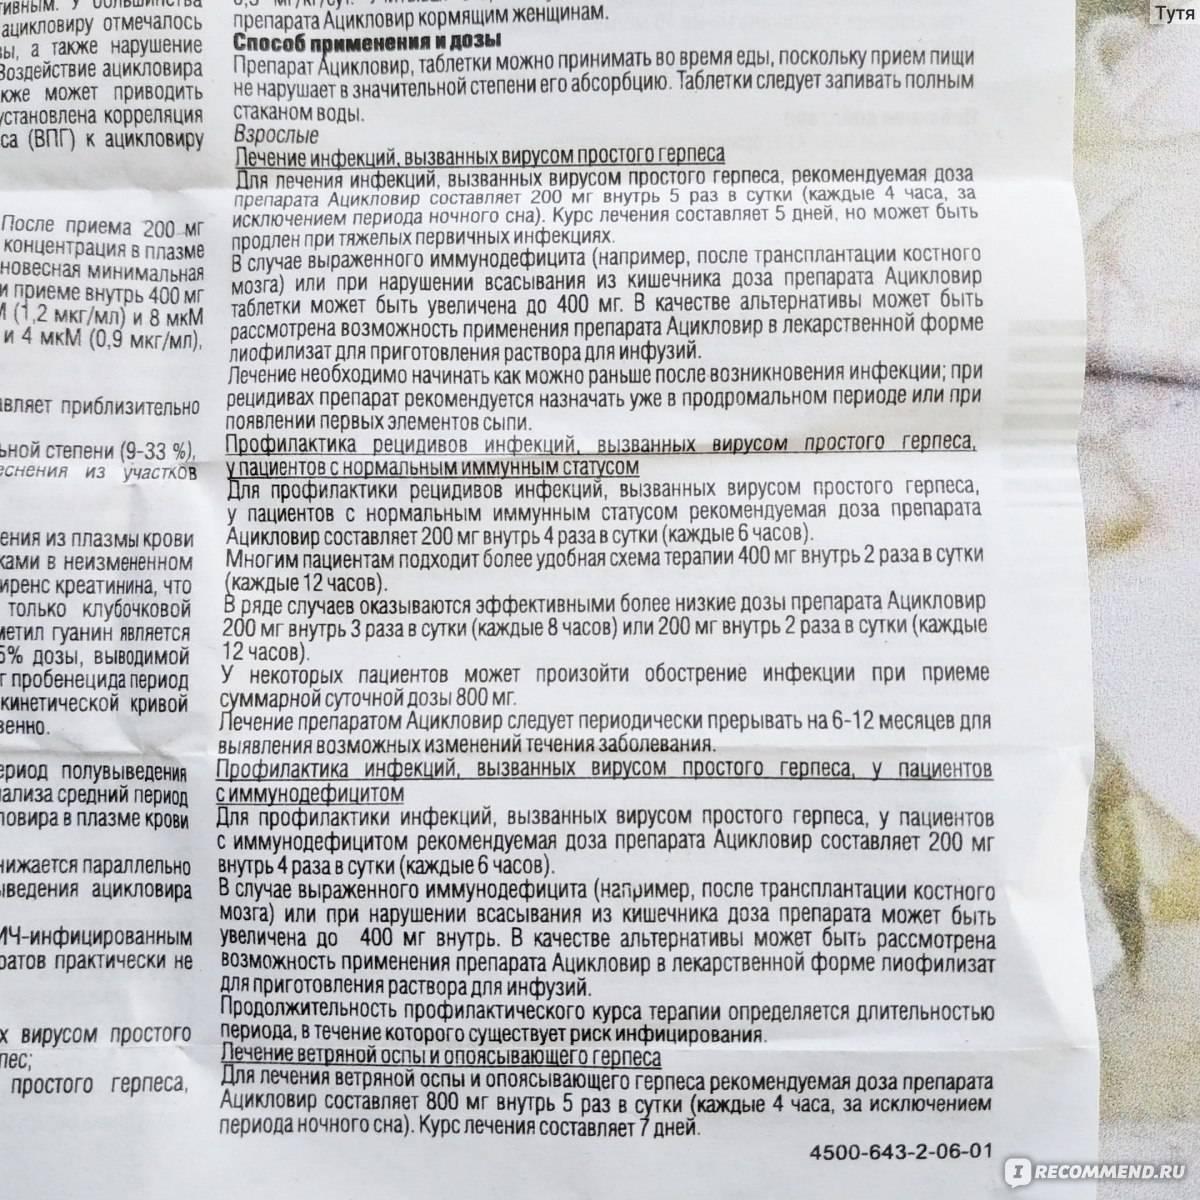 Лечение герпеса ацикловиром: применение таблеток и мази